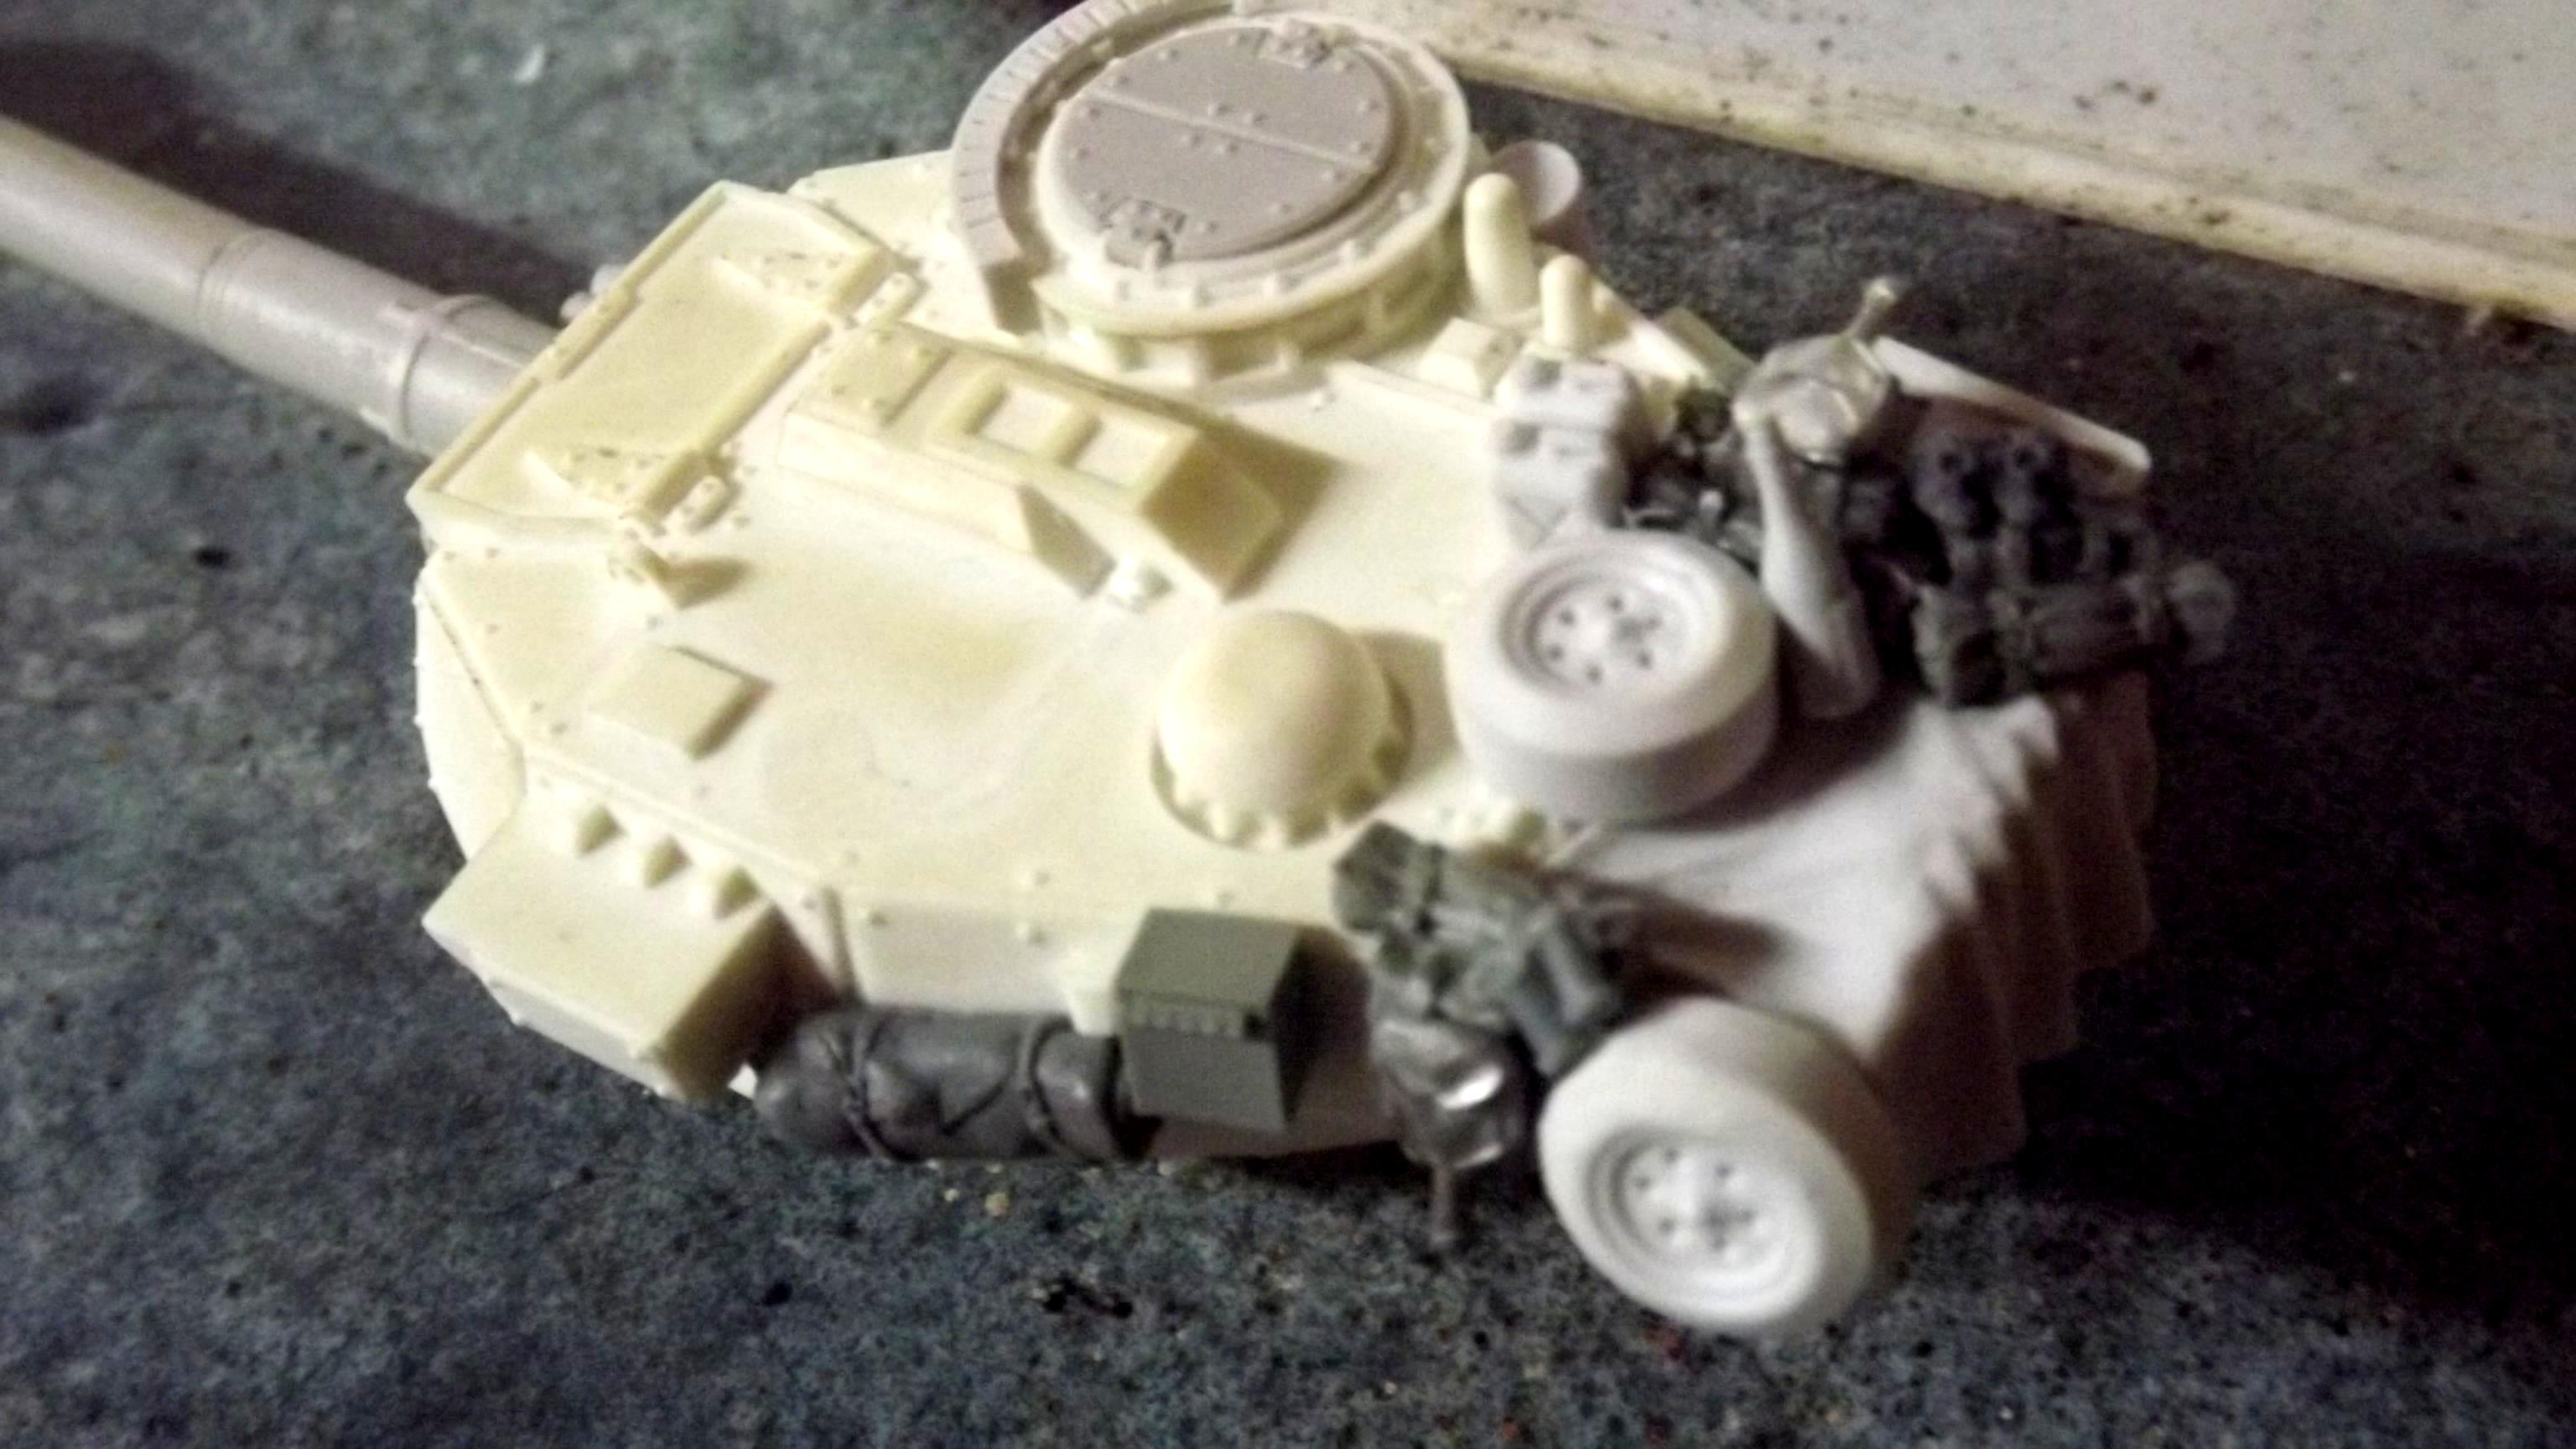 Medium Tank, Mortian, Stowage, Tankers, The Assault Group, Victoria Miniatures